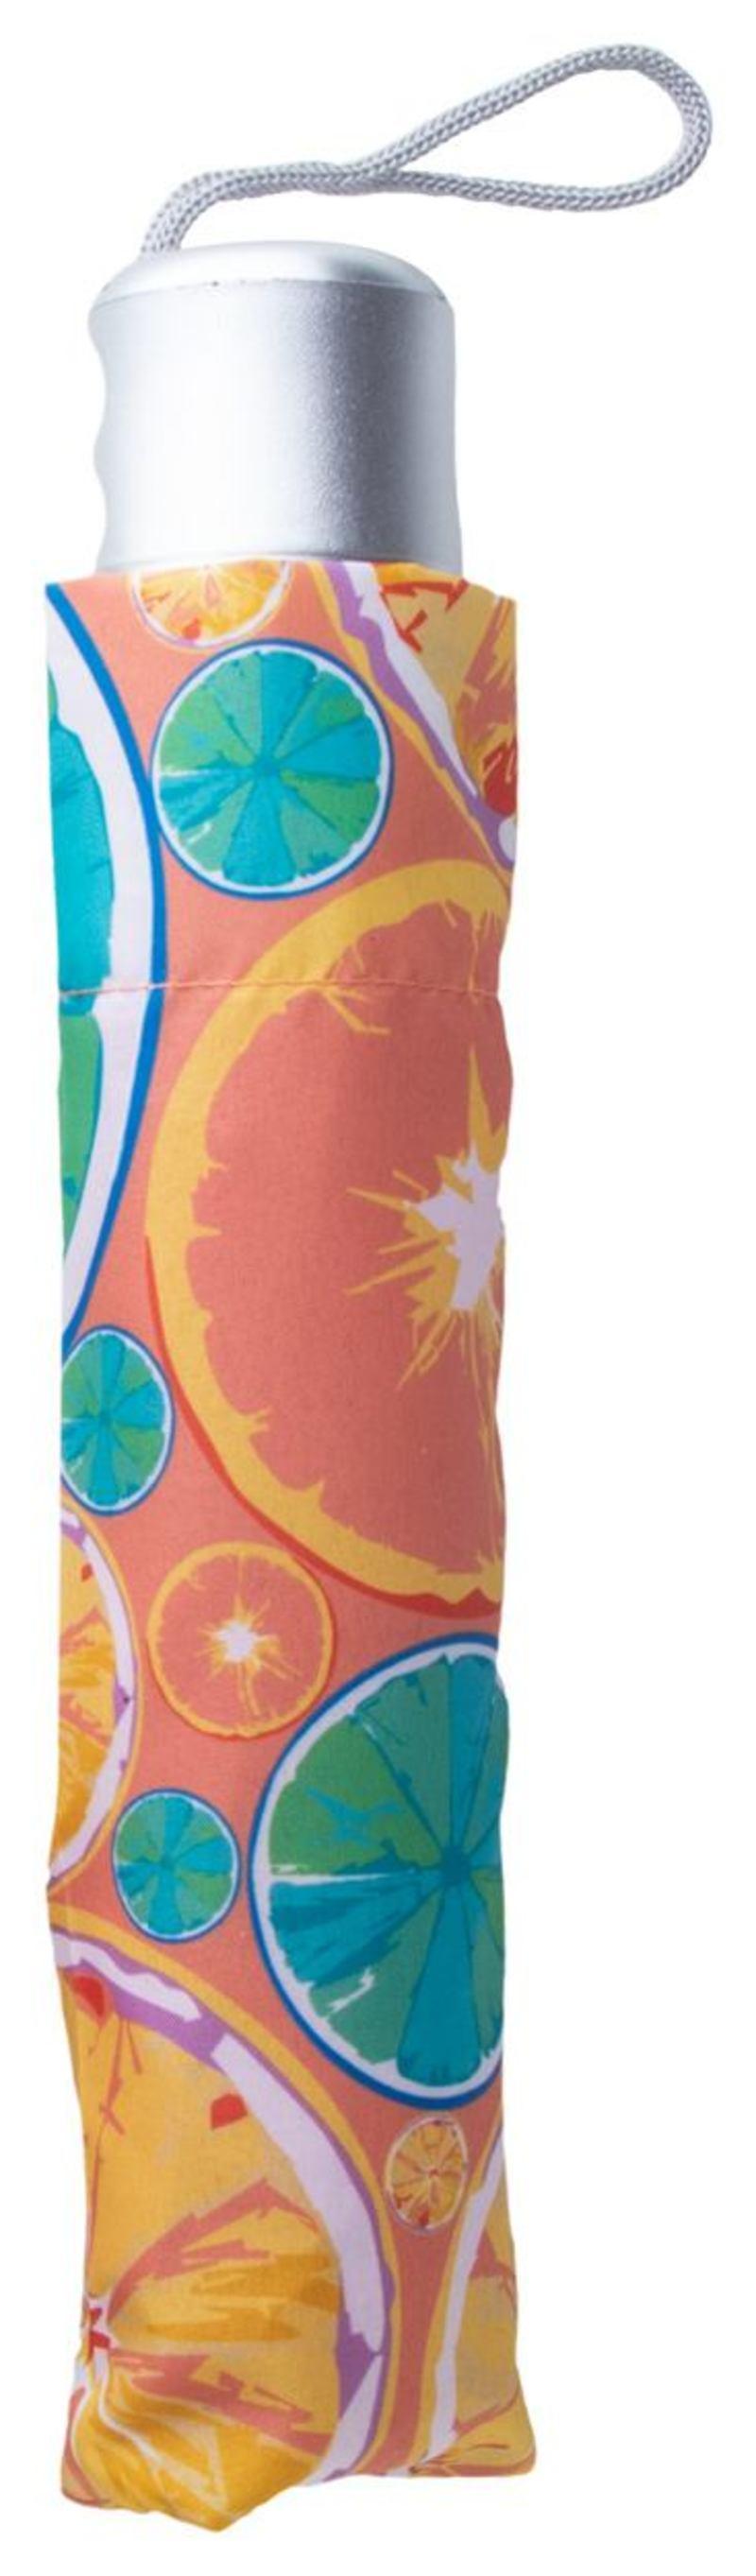 Flumber custom folding umbrella pouch